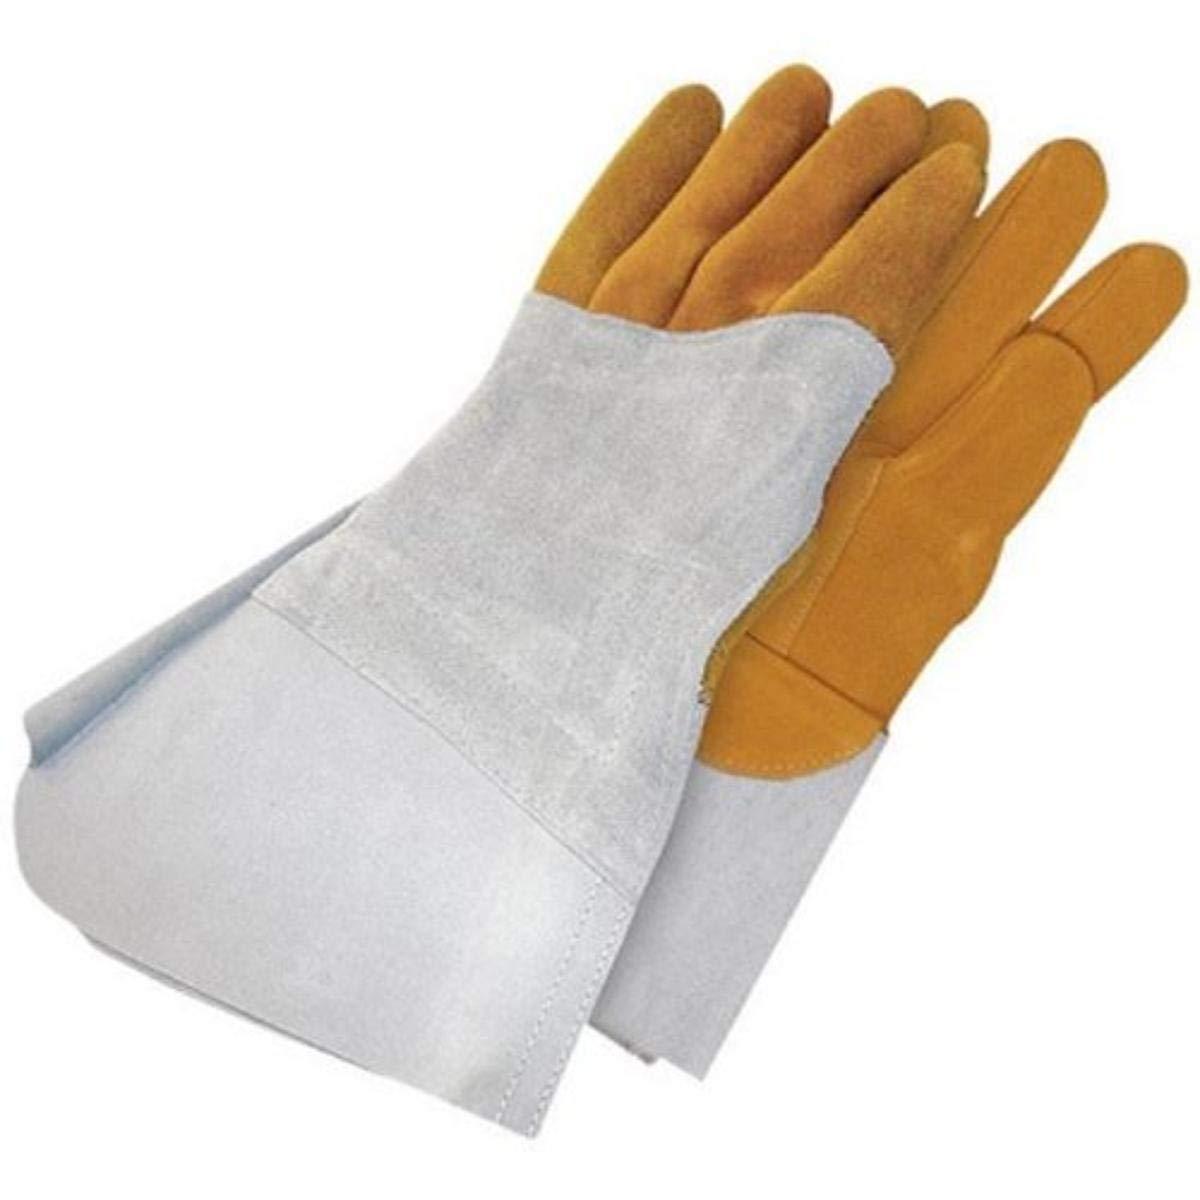 Grey//Tan Bob Dale 64-1-1525-9 Premium Reverse Grain Deerskin Welder Glove with Left Hand Patch Size 9